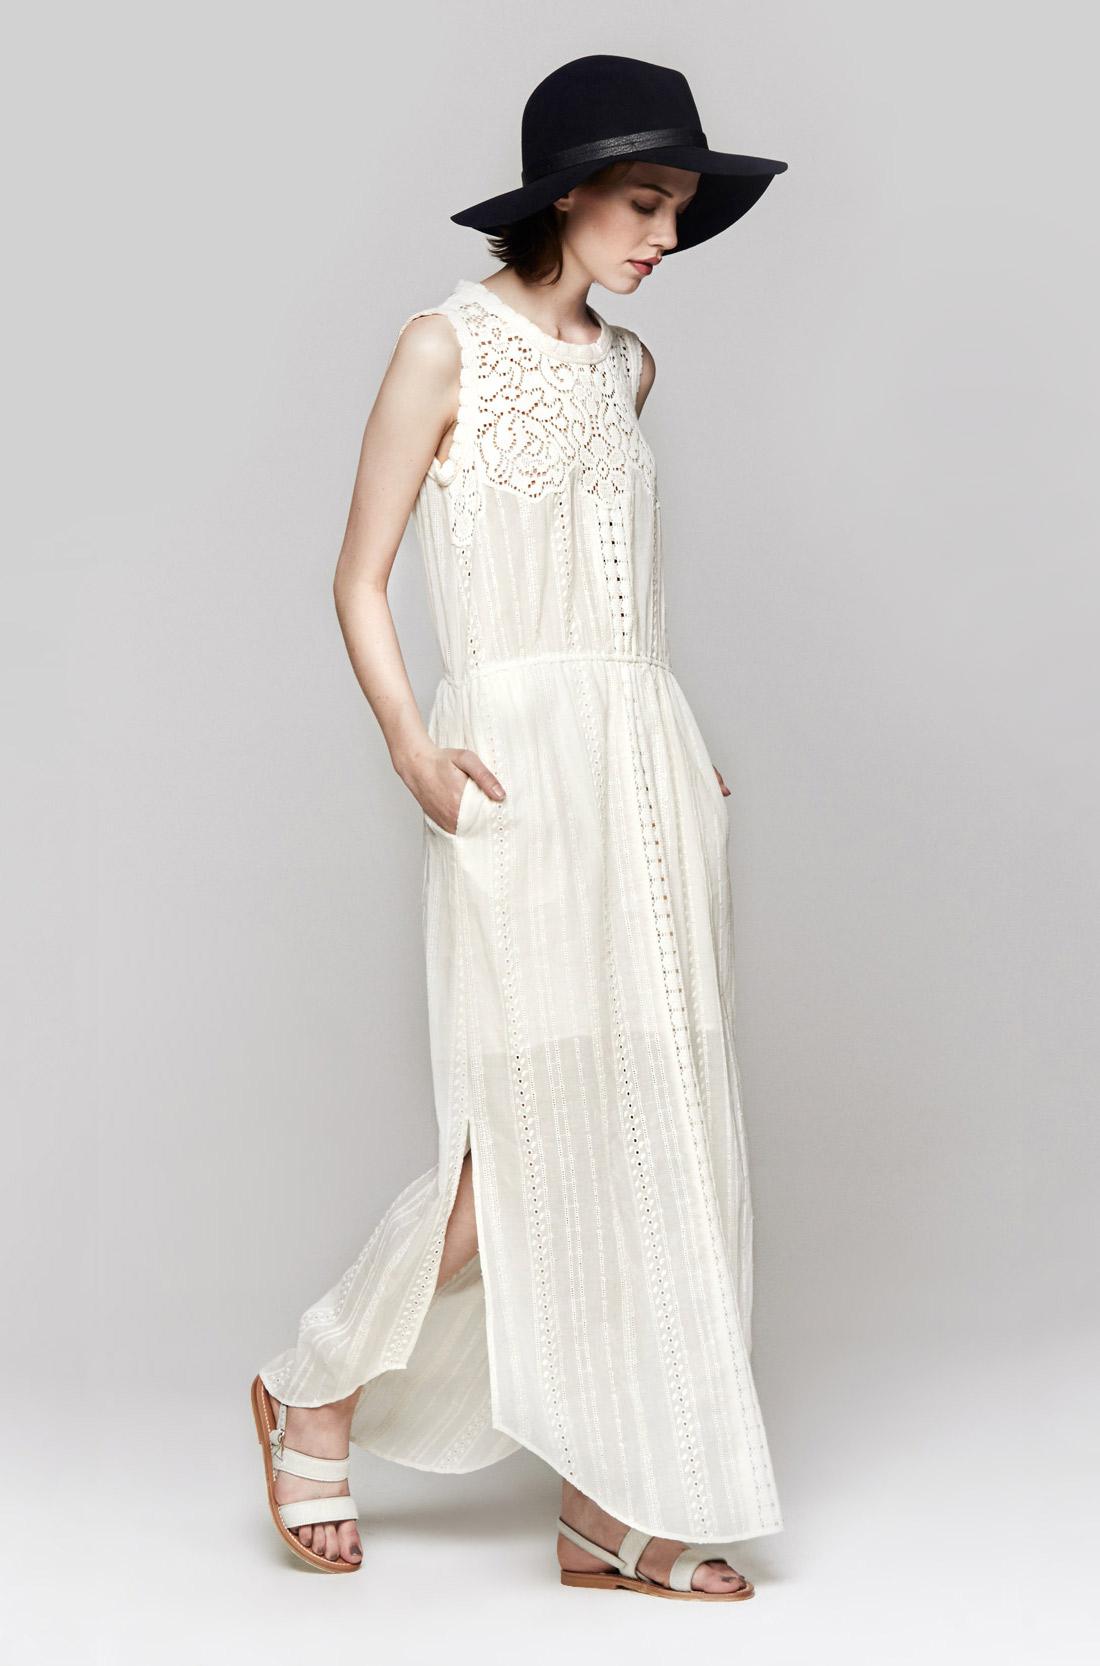 Lyst - Sea Lace Eyelet Long Dress in White